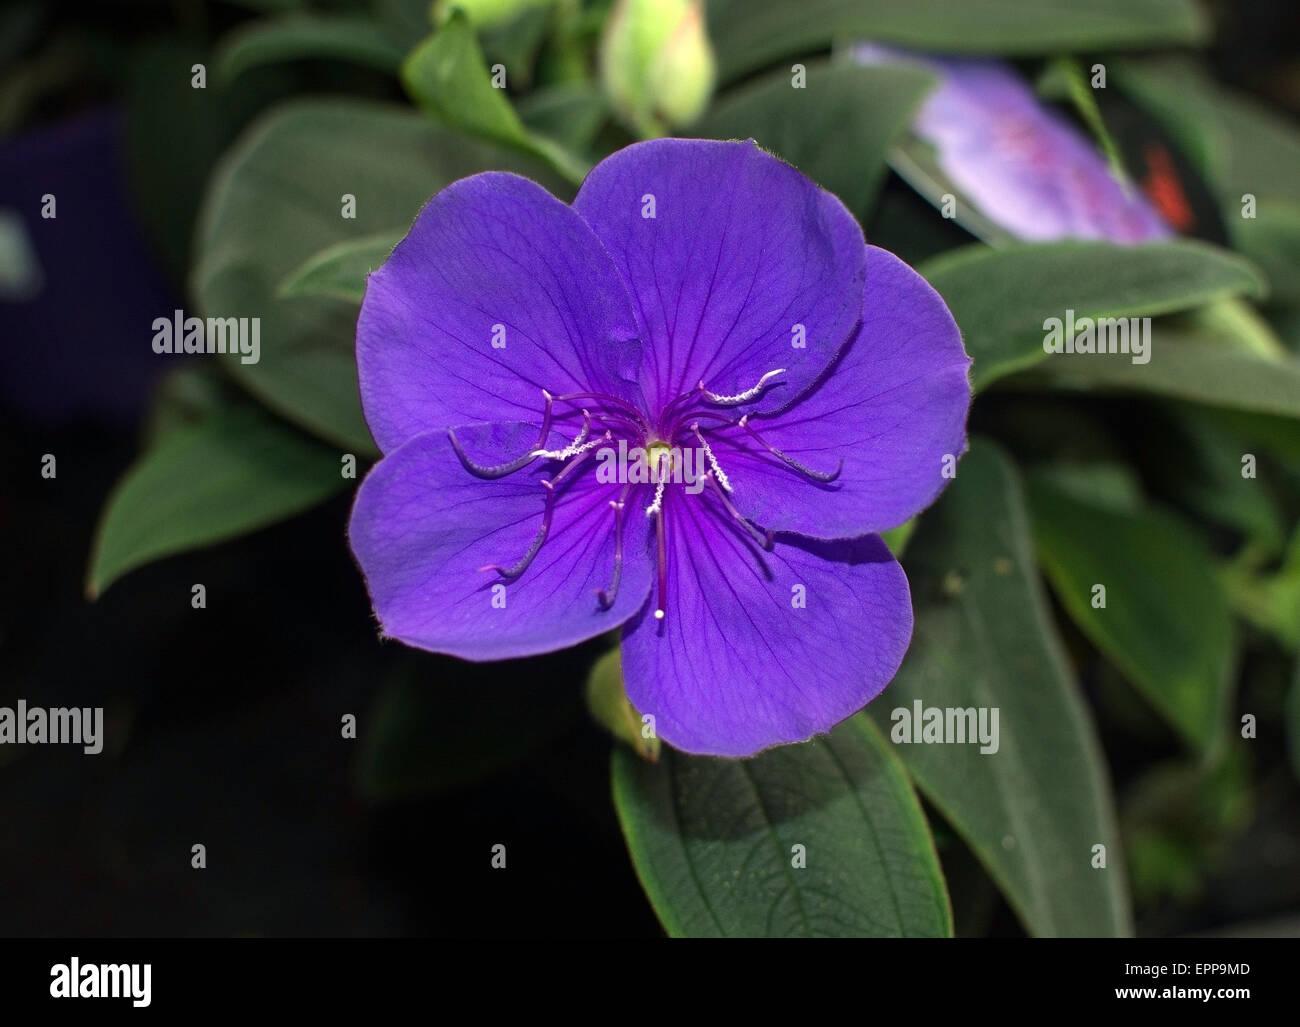 Glorybush tibouchina purple beautiful and exotic tropical flower glorybush tibouchina purple beautiful and exotic tropical flower with many names such as princess flower glorybush lasiandra izmirmasajfo Images